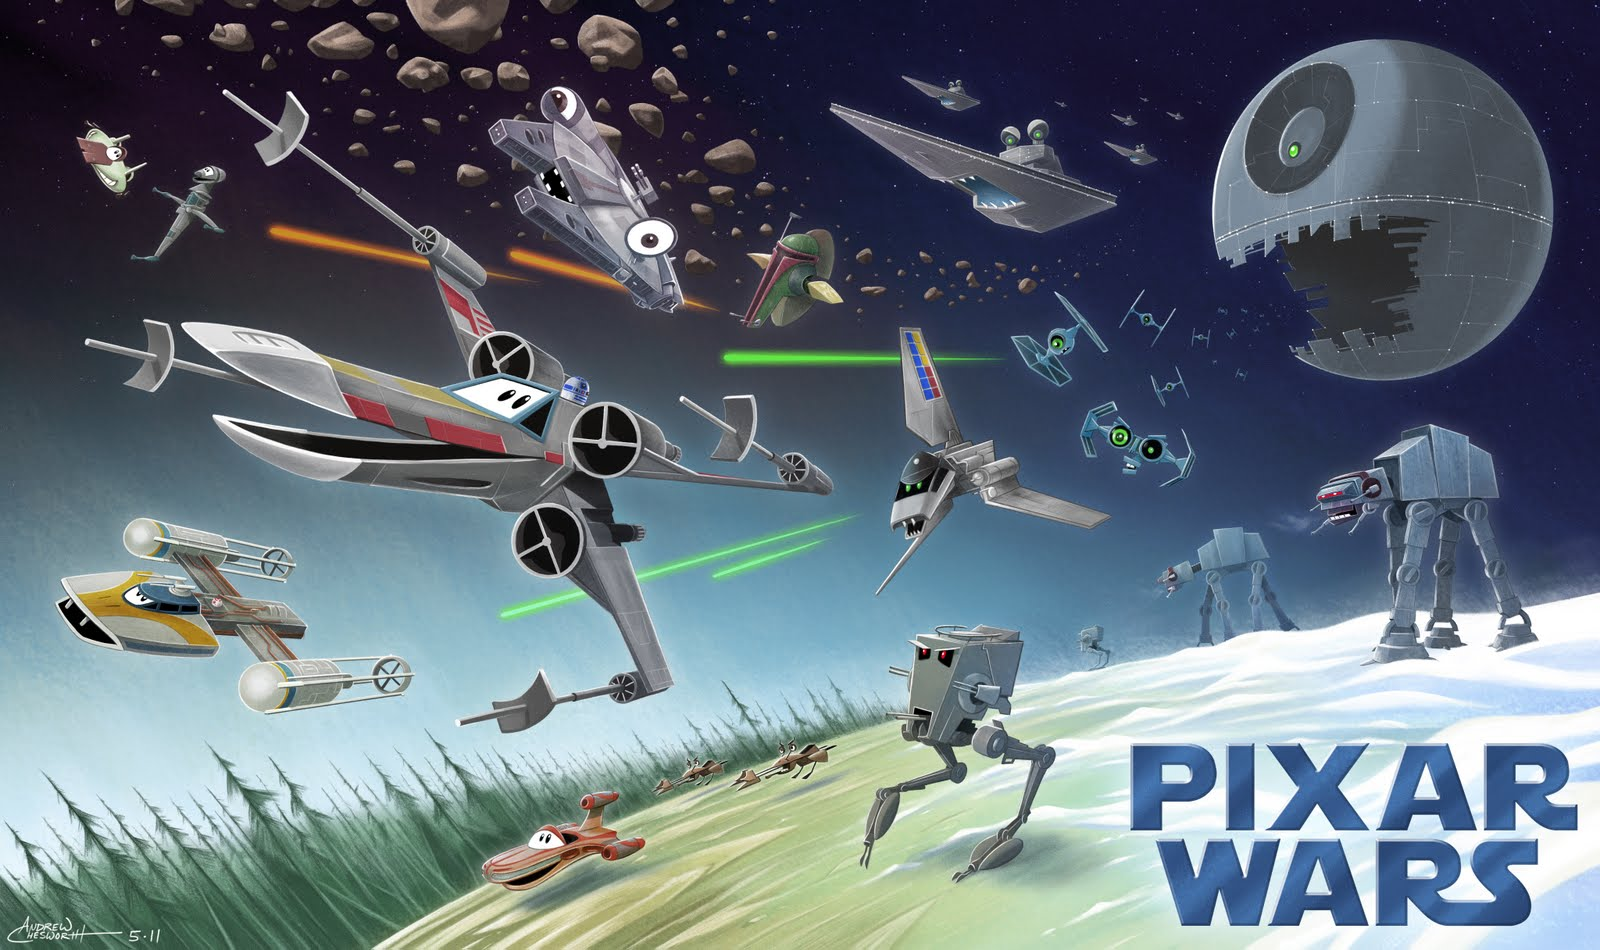 Pixar Wars